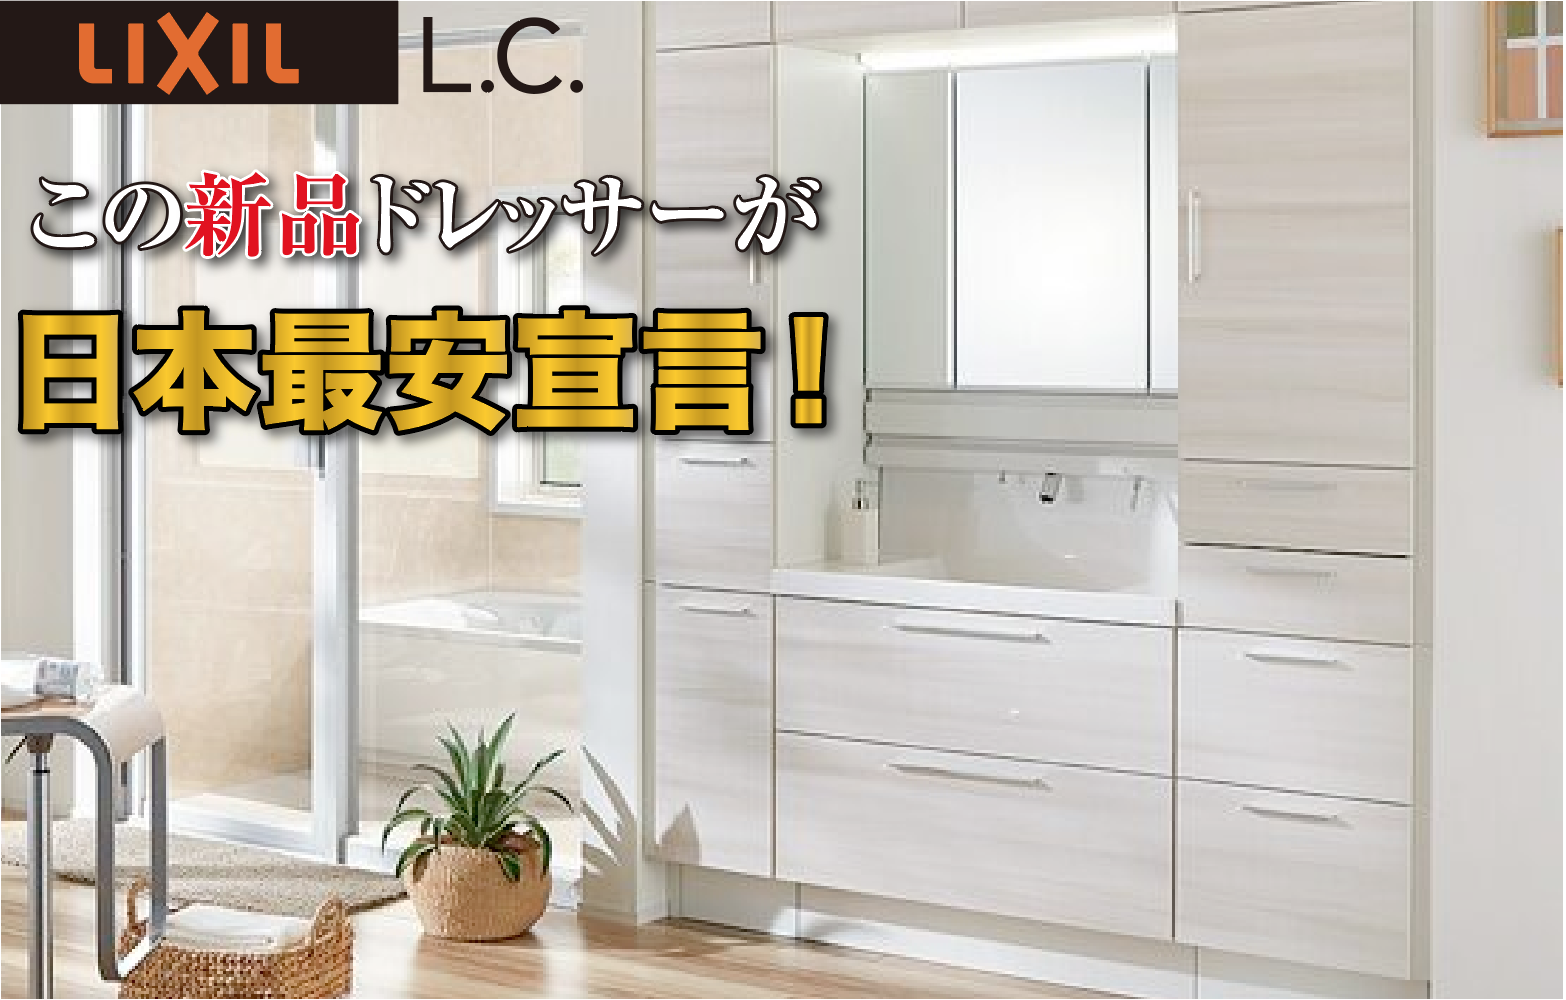 LIXIL洗面化粧台L.C.(エルシー)